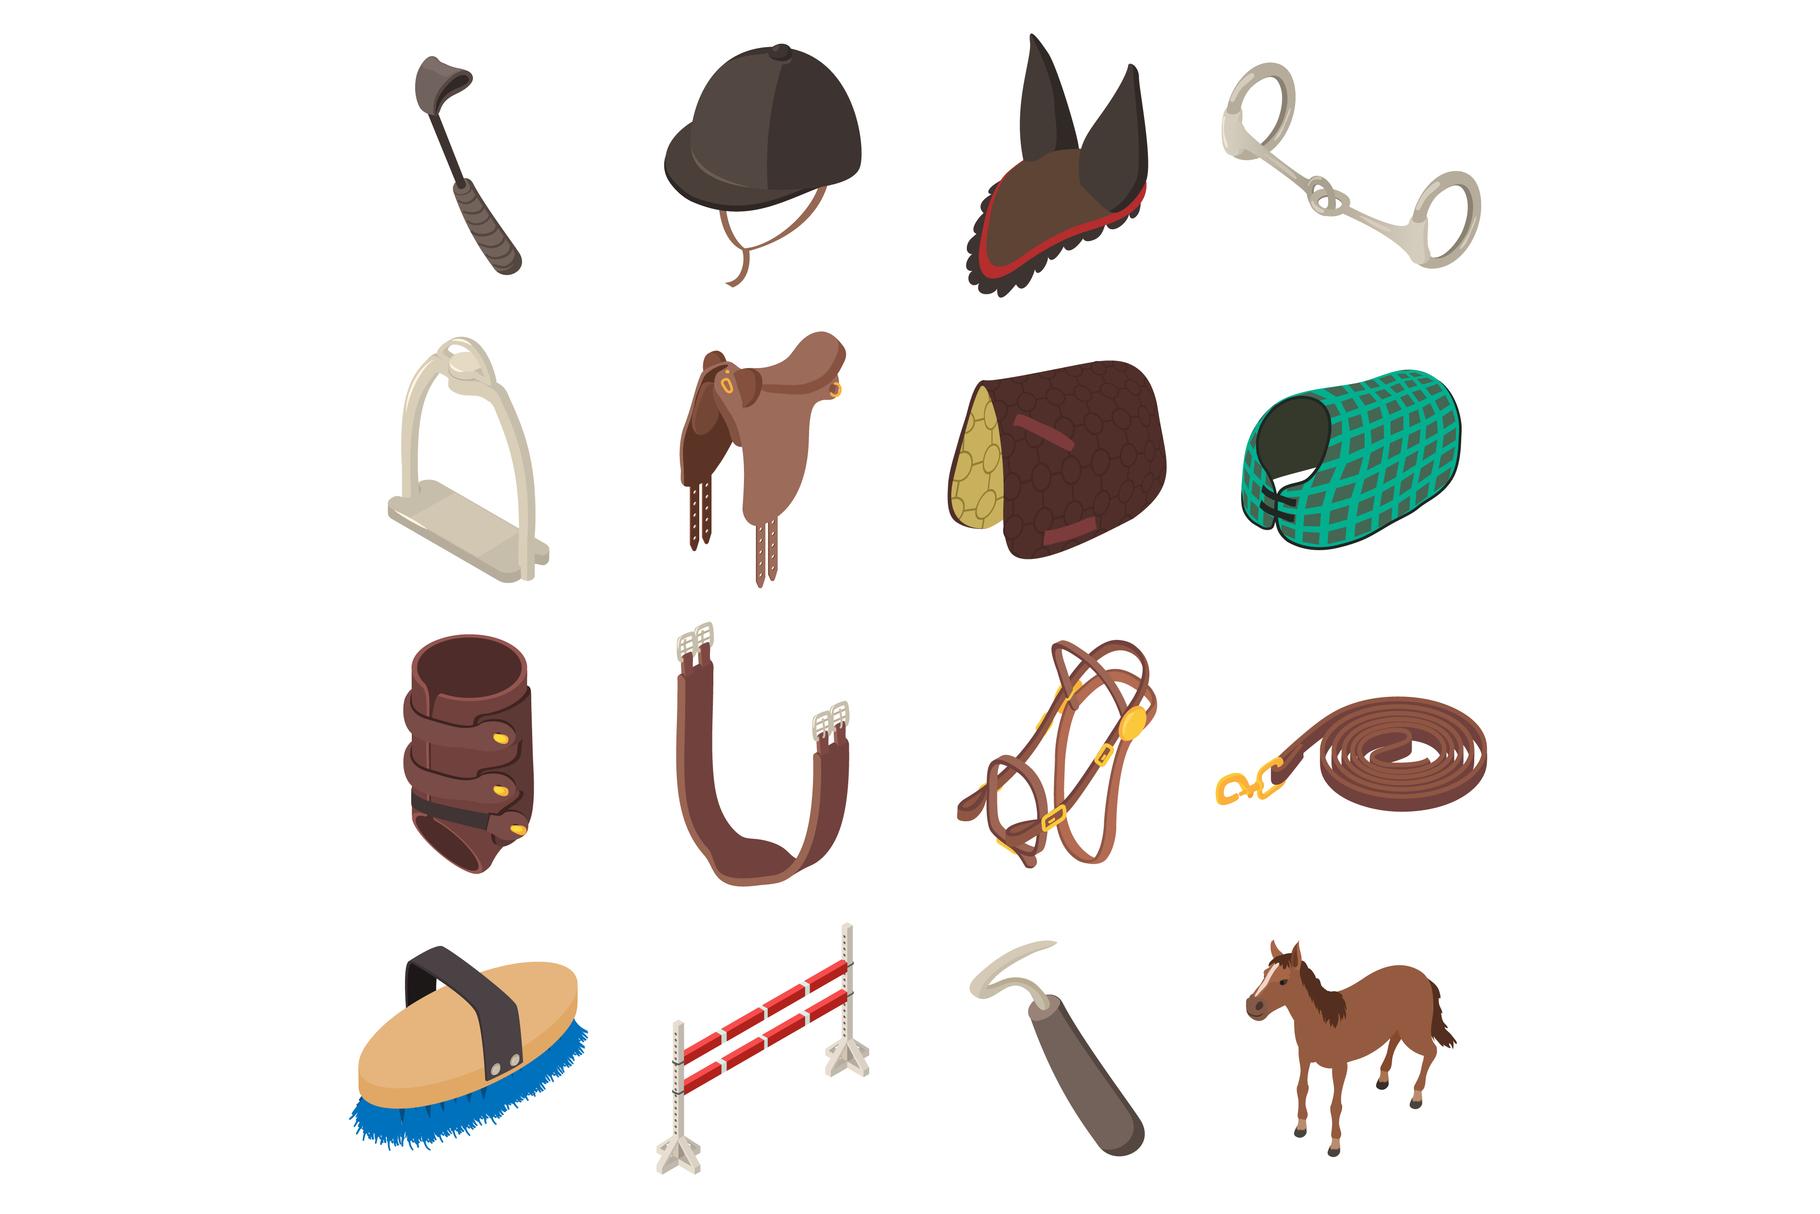 Horse sport equipment icons set, isometric style example image 1